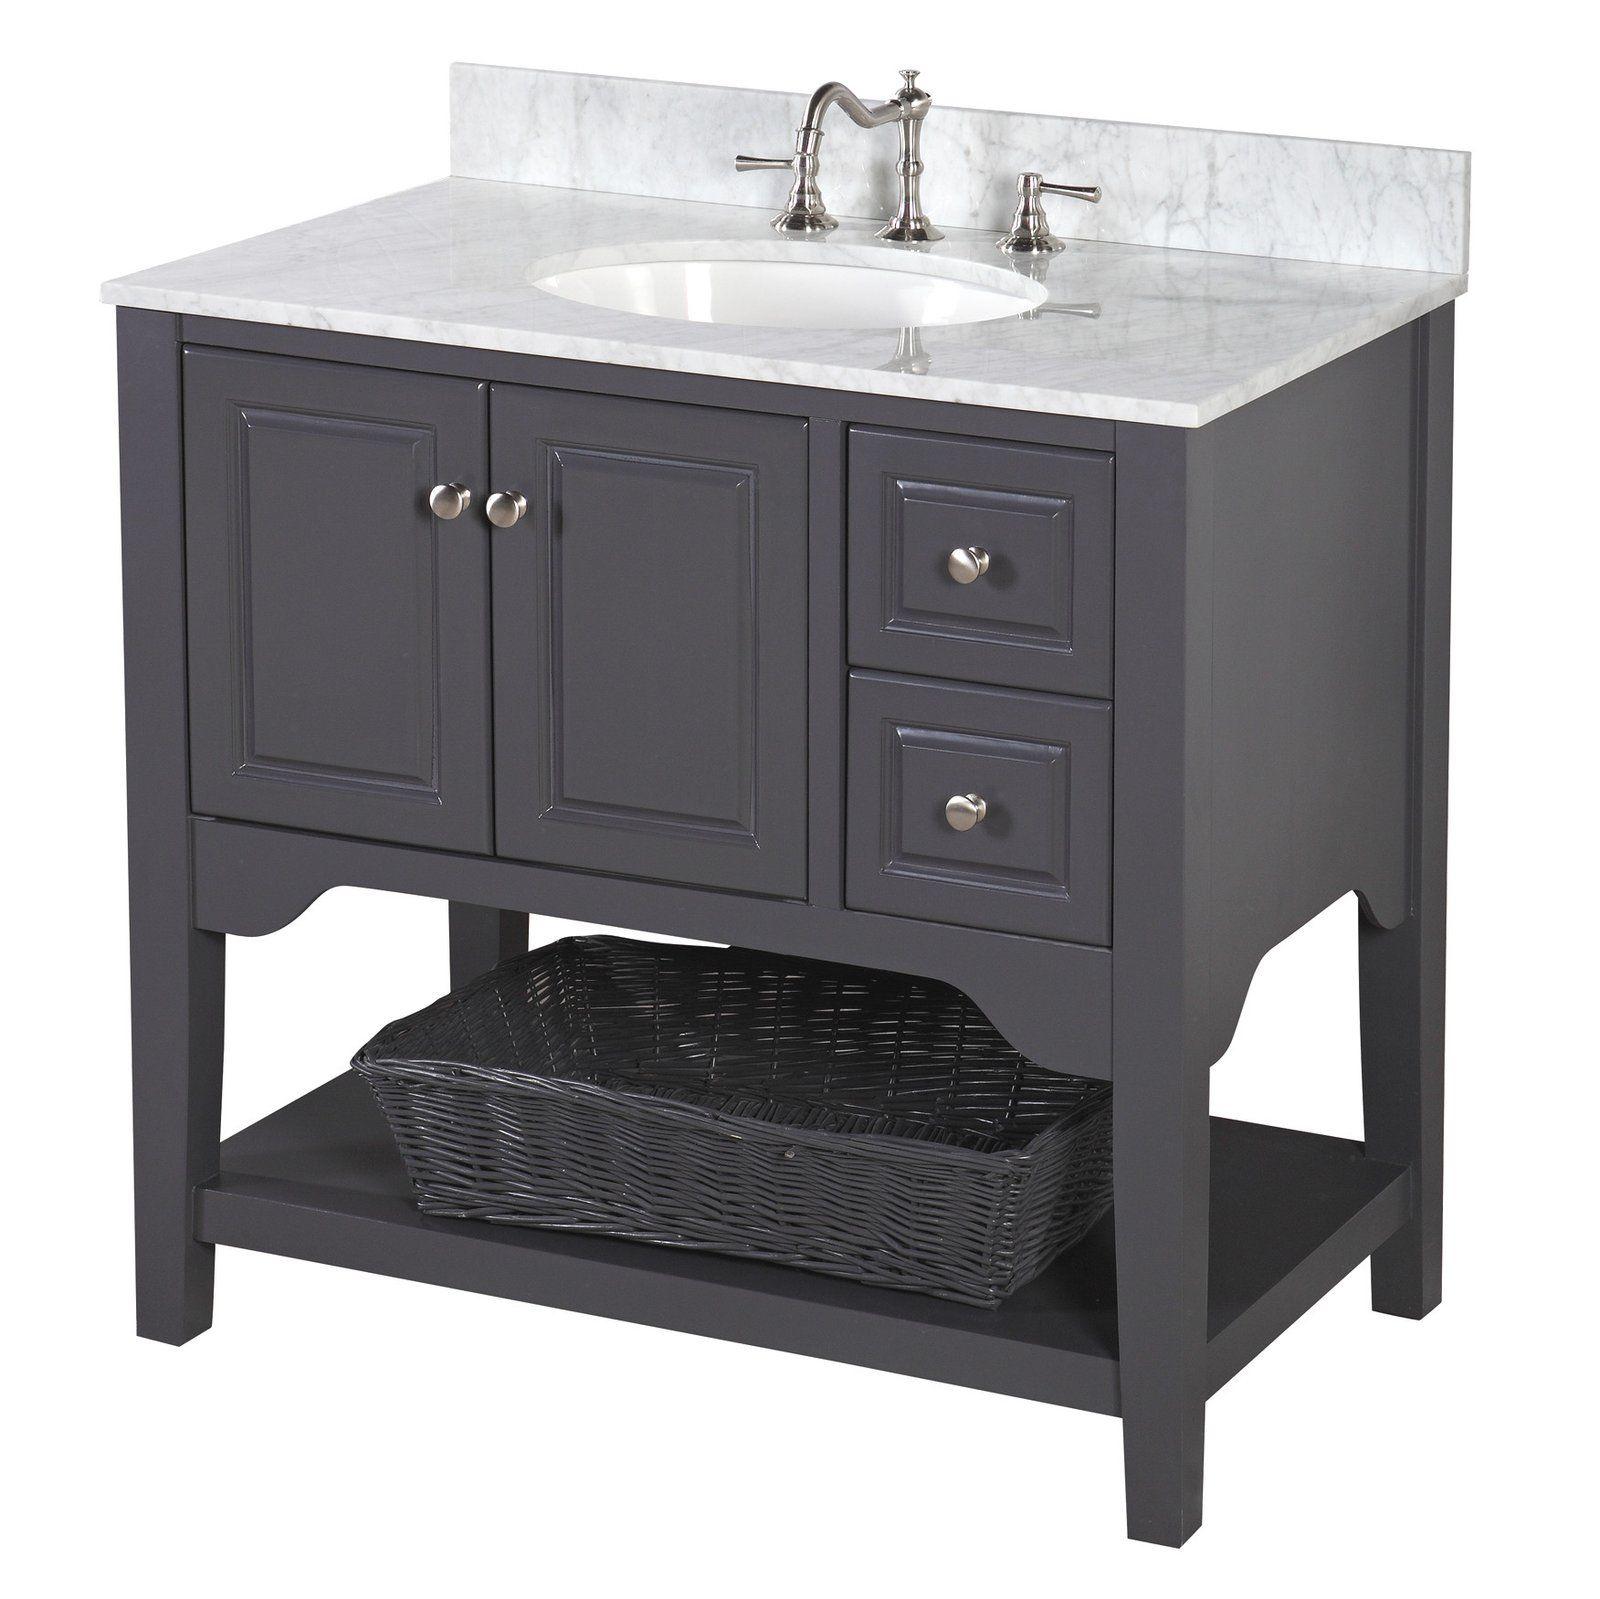 Washington 36 Inch Vanity With Carrara Marble Top Bathroom Vanity Single Bathroom Vanity 36 Inch Bathroom Vanity 36 inch black bathroom vanity